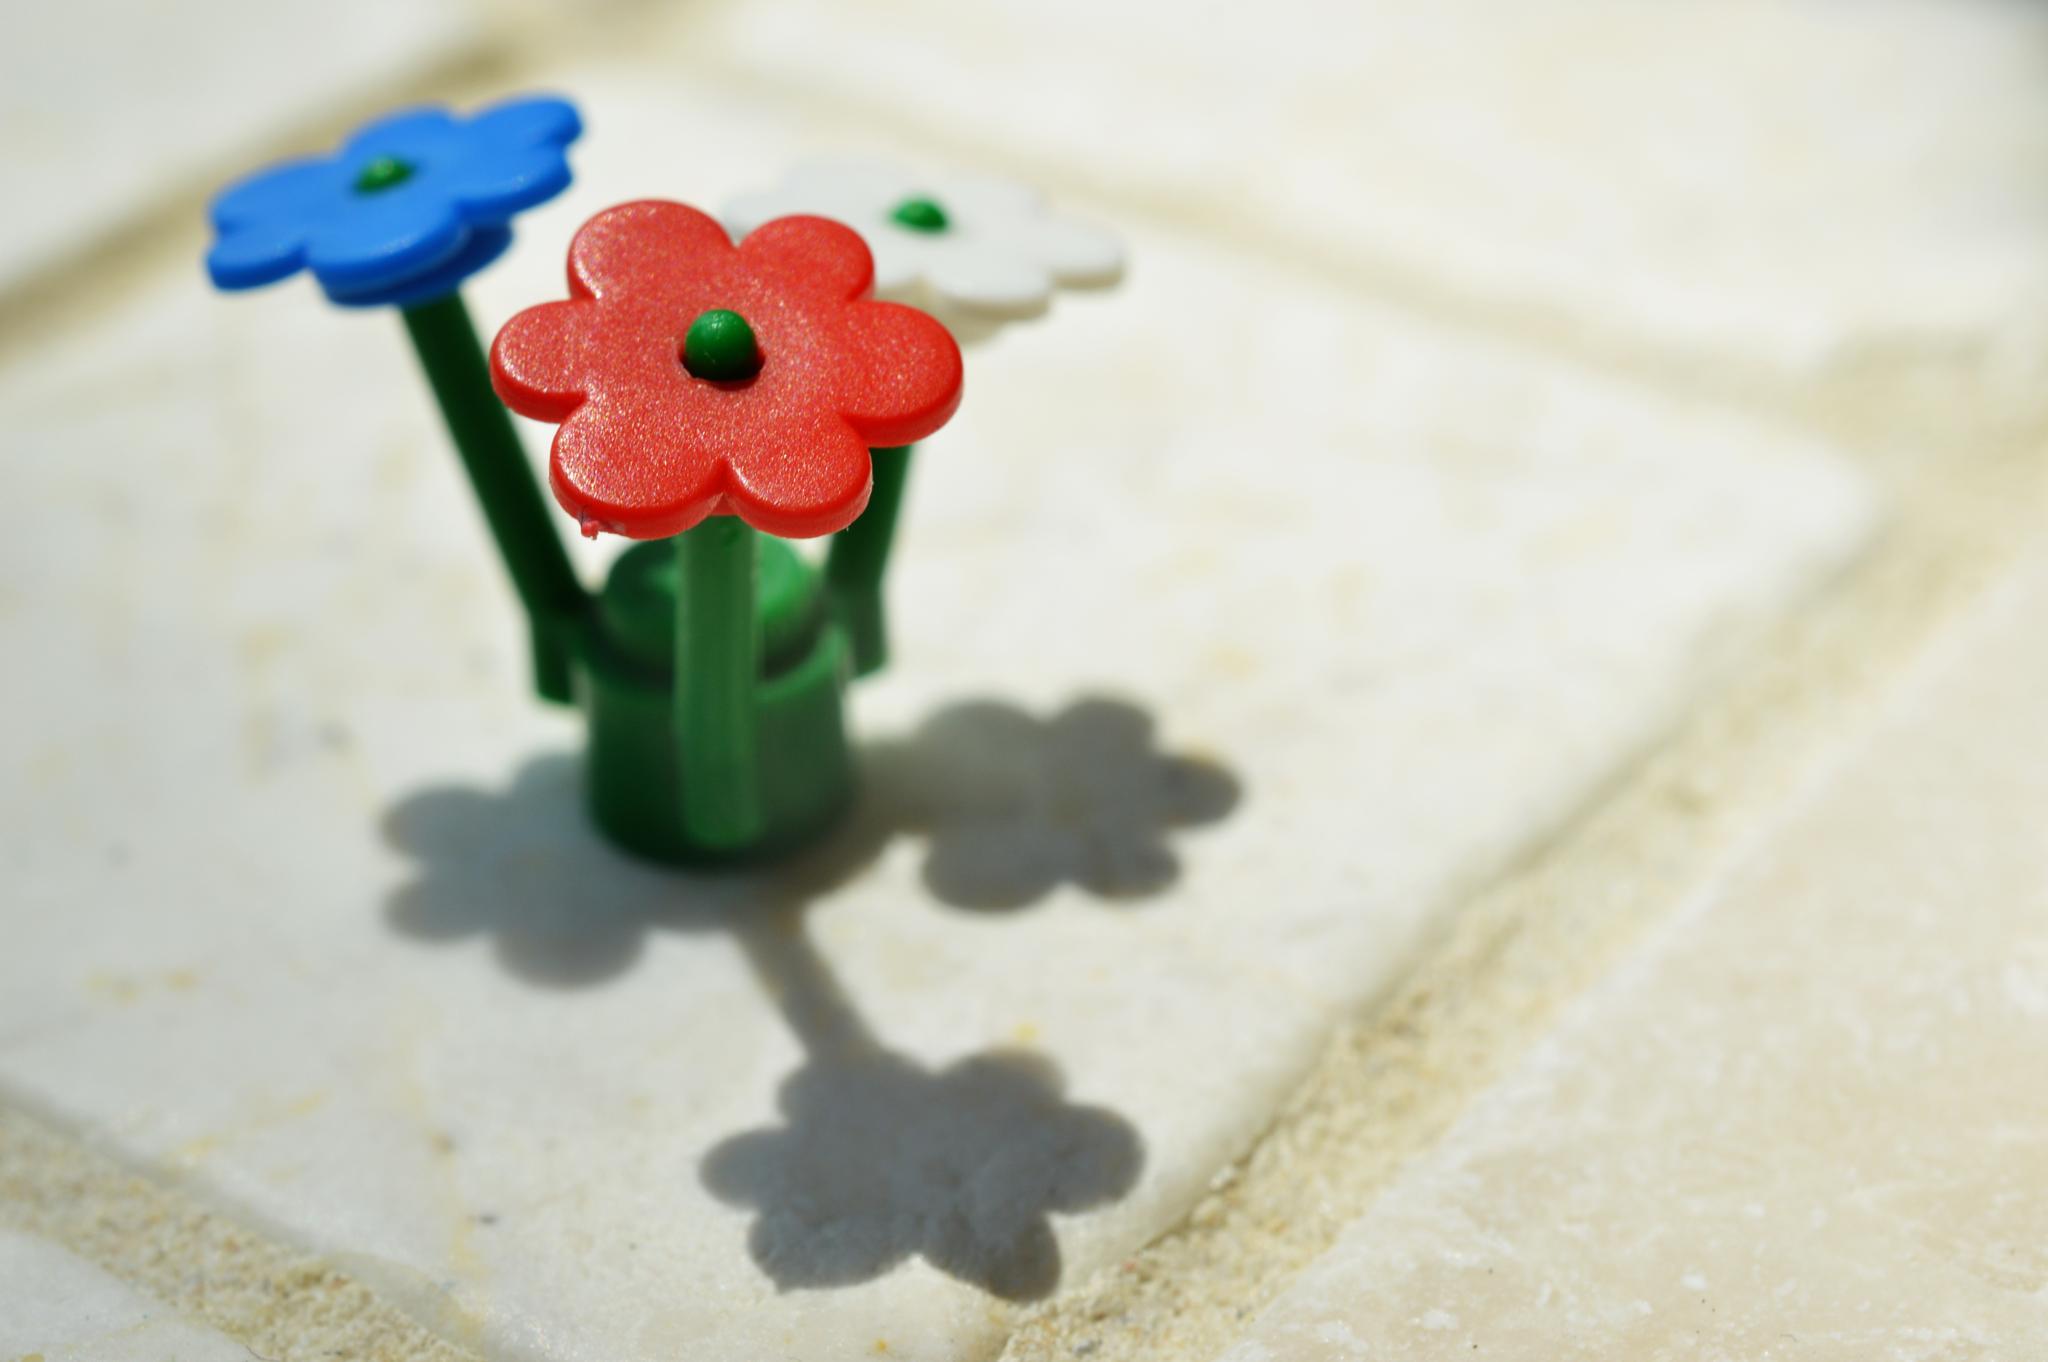 Lego flowers by JessicaGreenslade